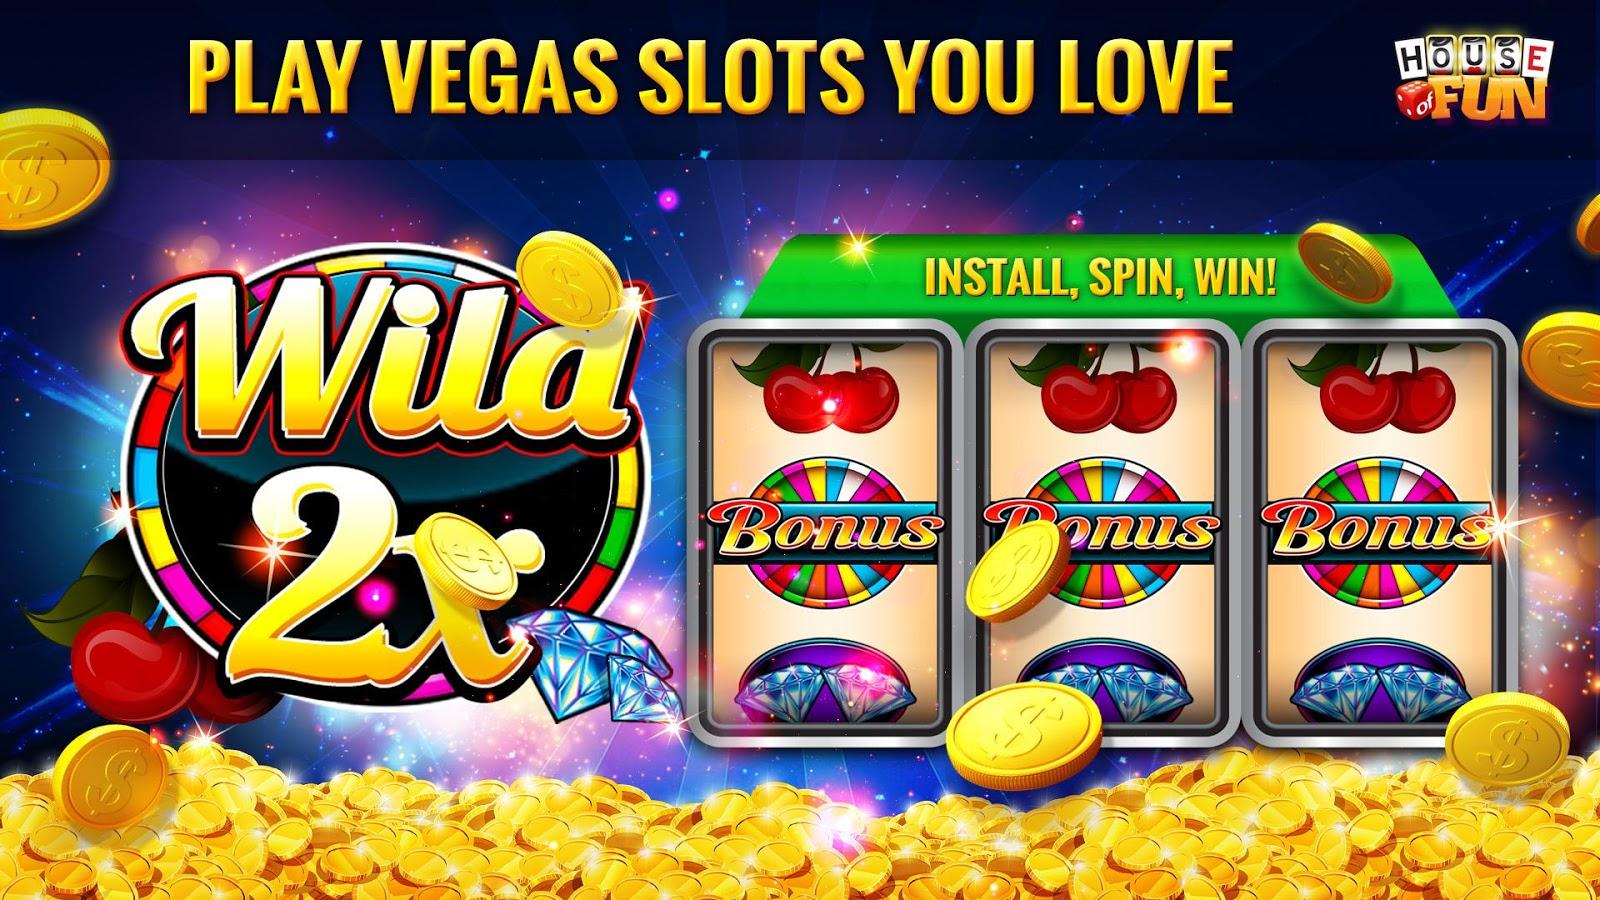 Fun House Slots